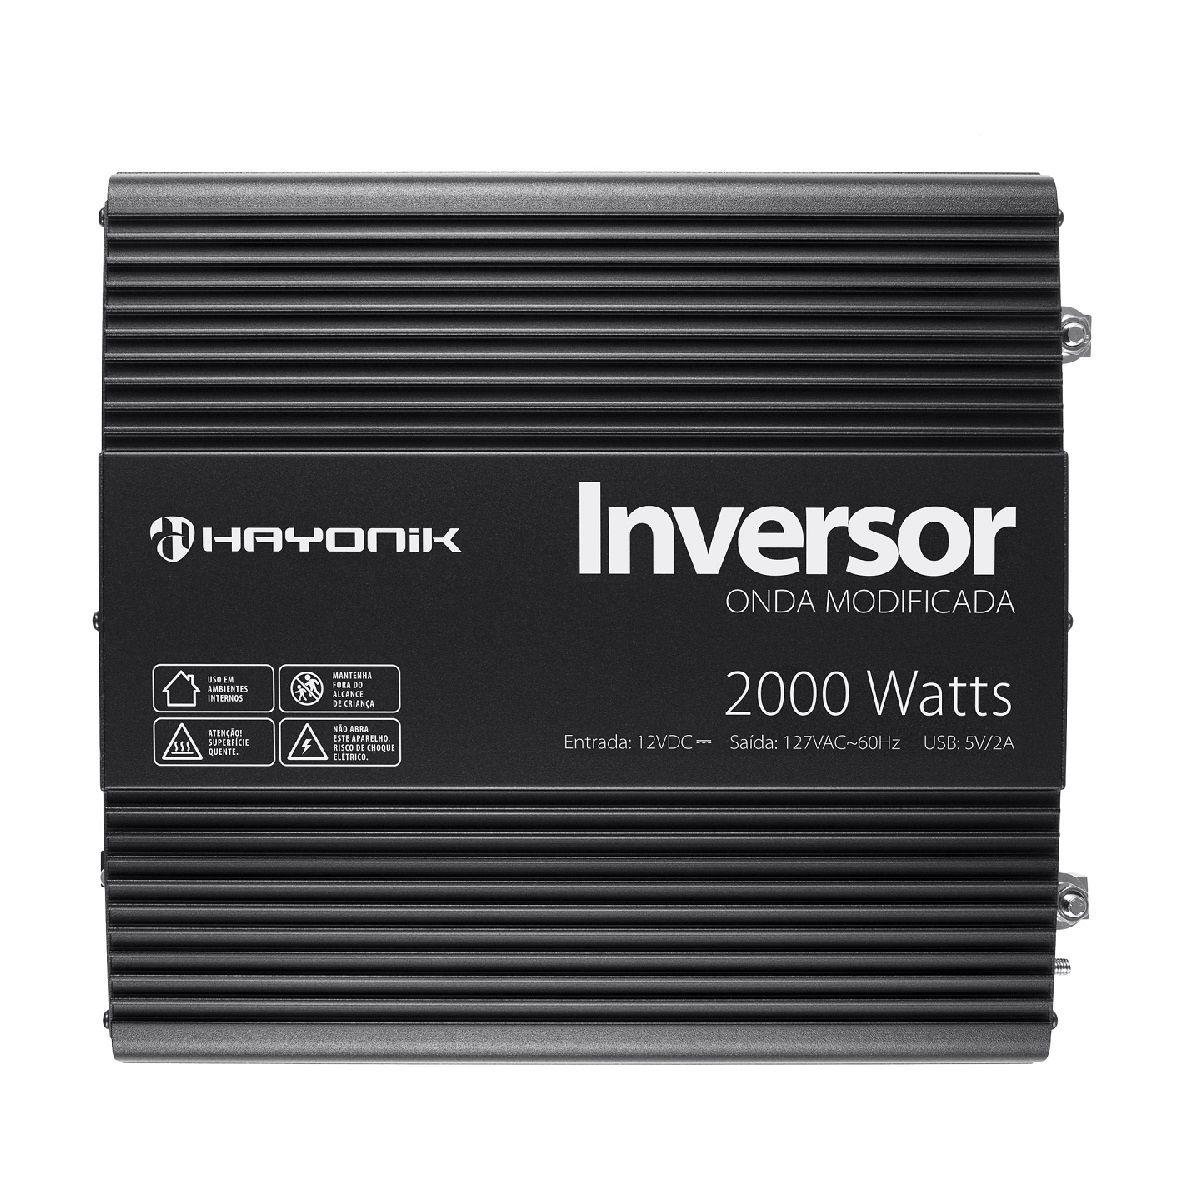 Inversor de Onda Modificada 2000W 12VDC 127V - PW11-4